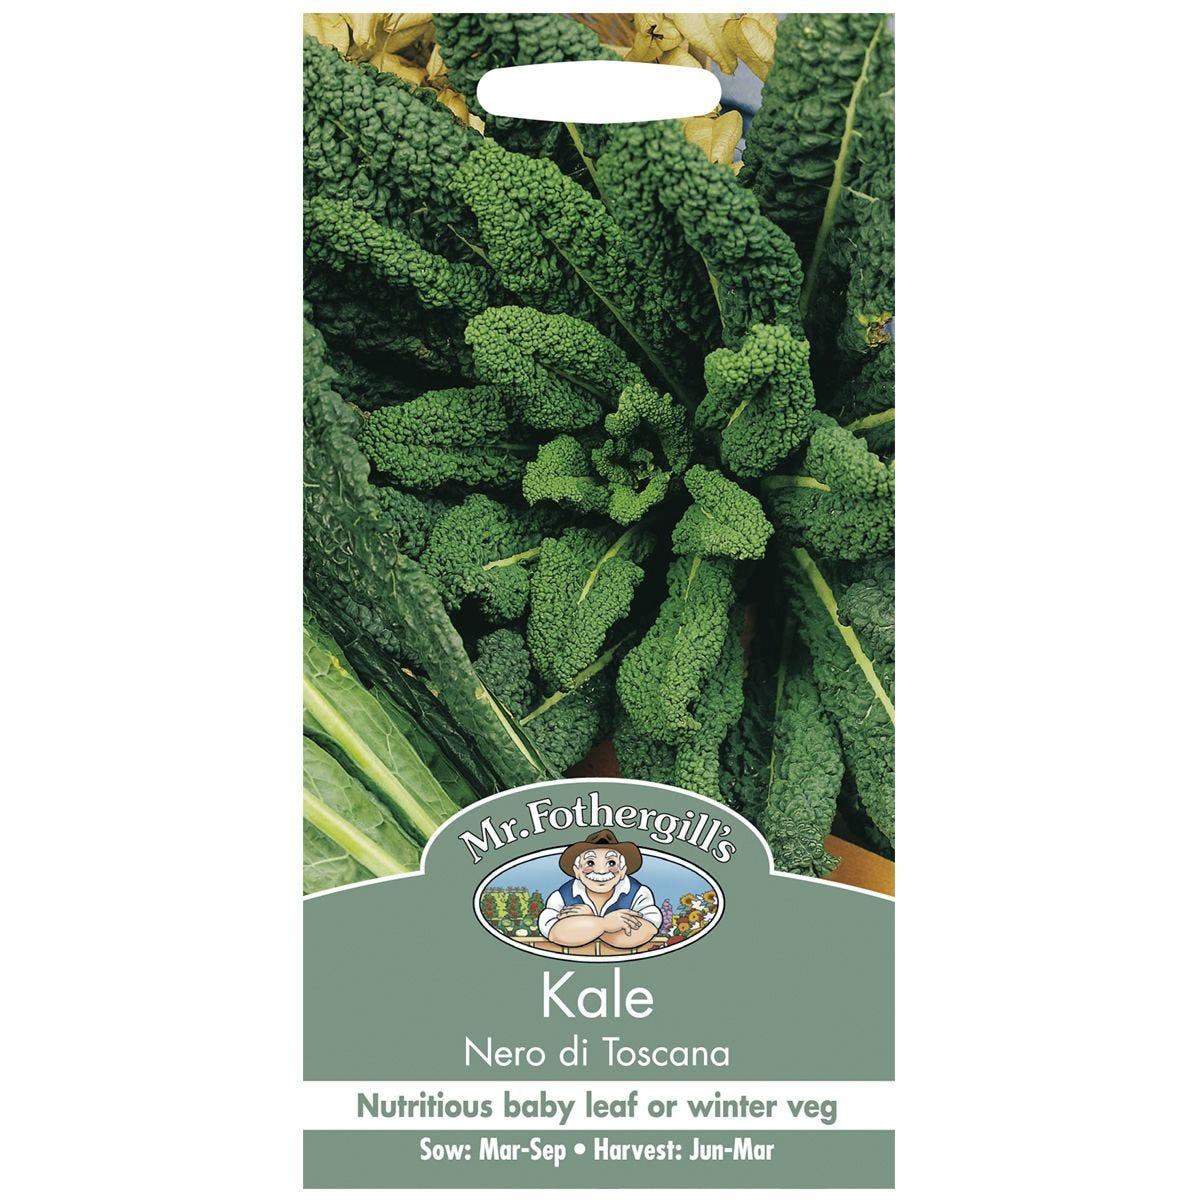 Mr Fothergill's Kale Nero Di Toscana Seeds